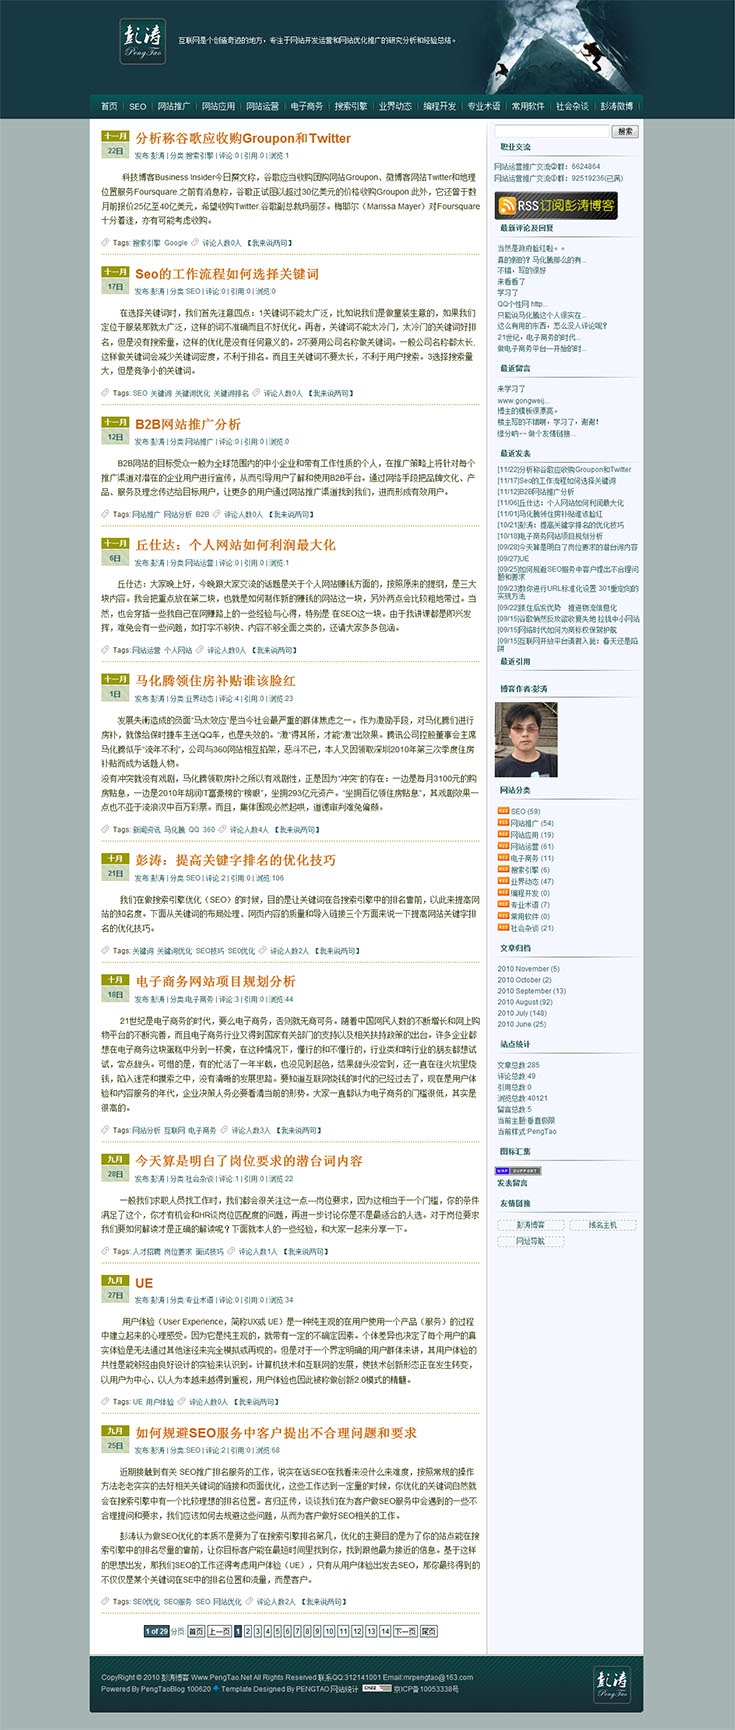 zblog主题模板ASP版Z-Blog主题模板